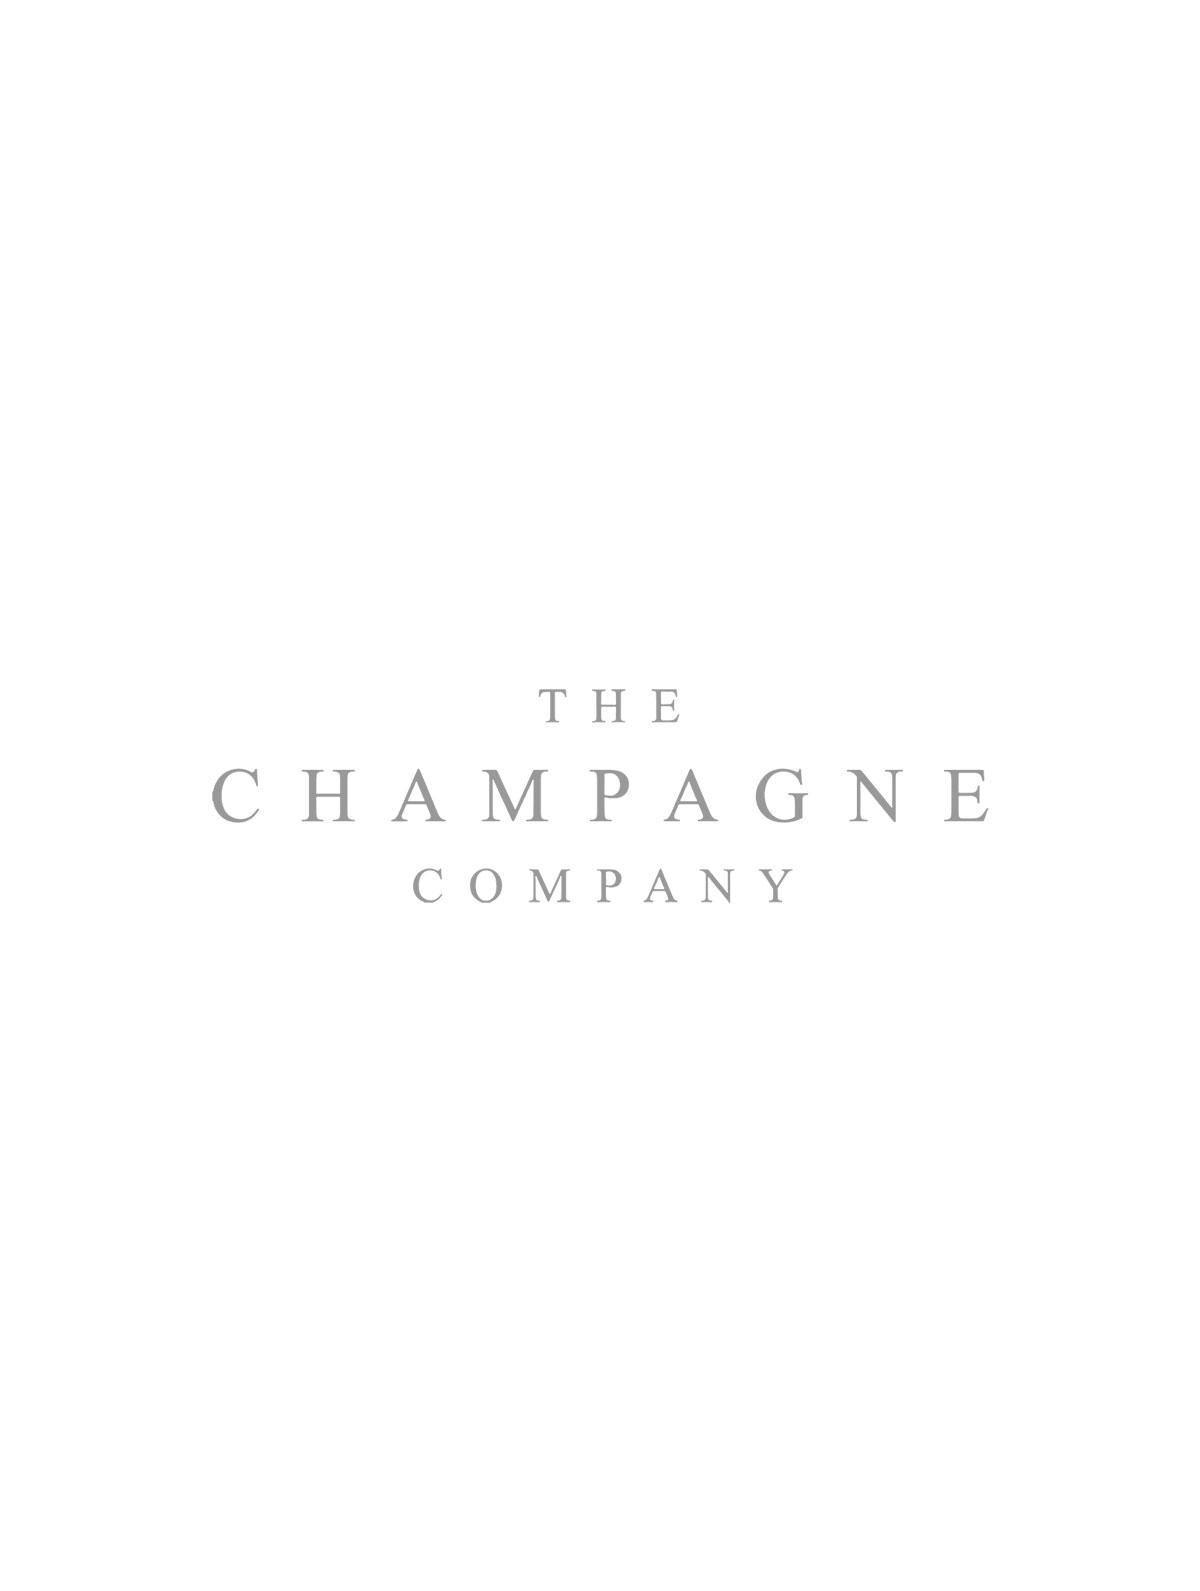 Bonny Doon Vineyard Le Cigare Blanc 2011 White Wine 75cl